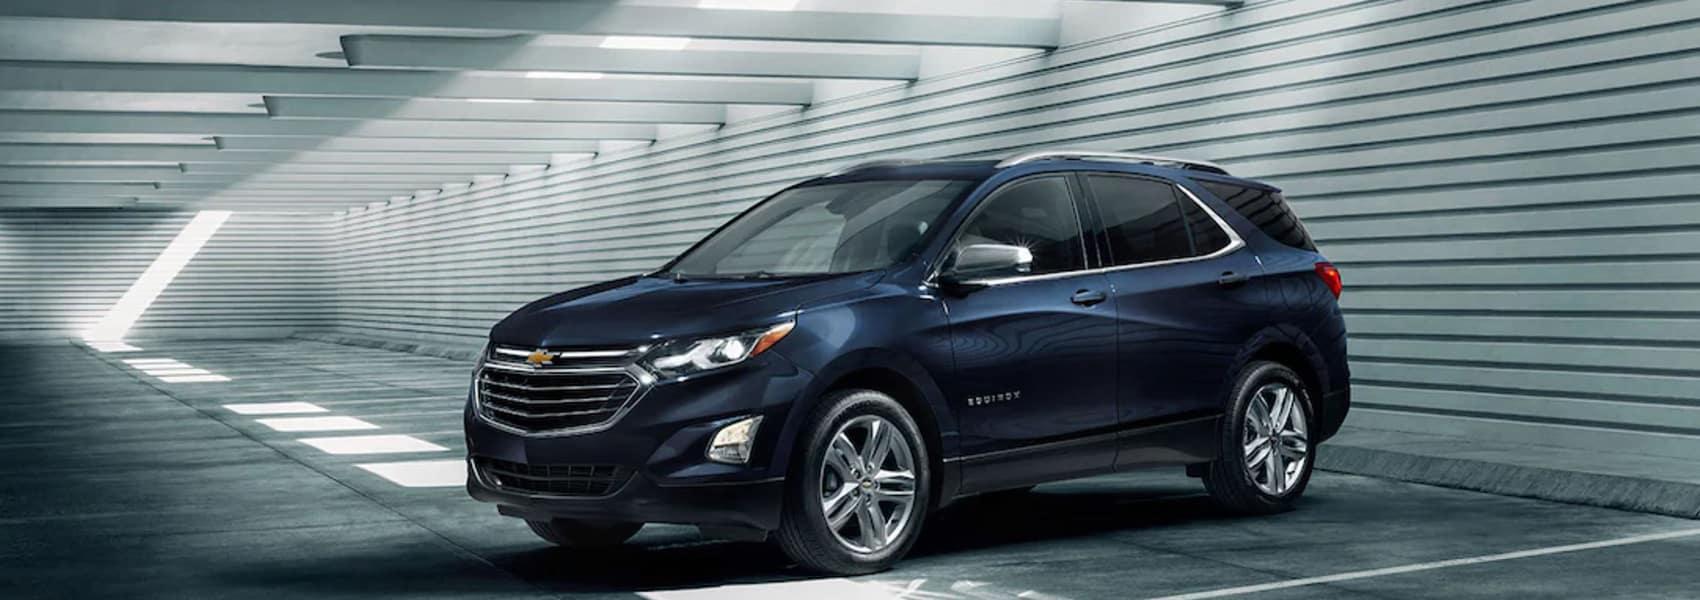 The New 2021 Chevrolet Equinox